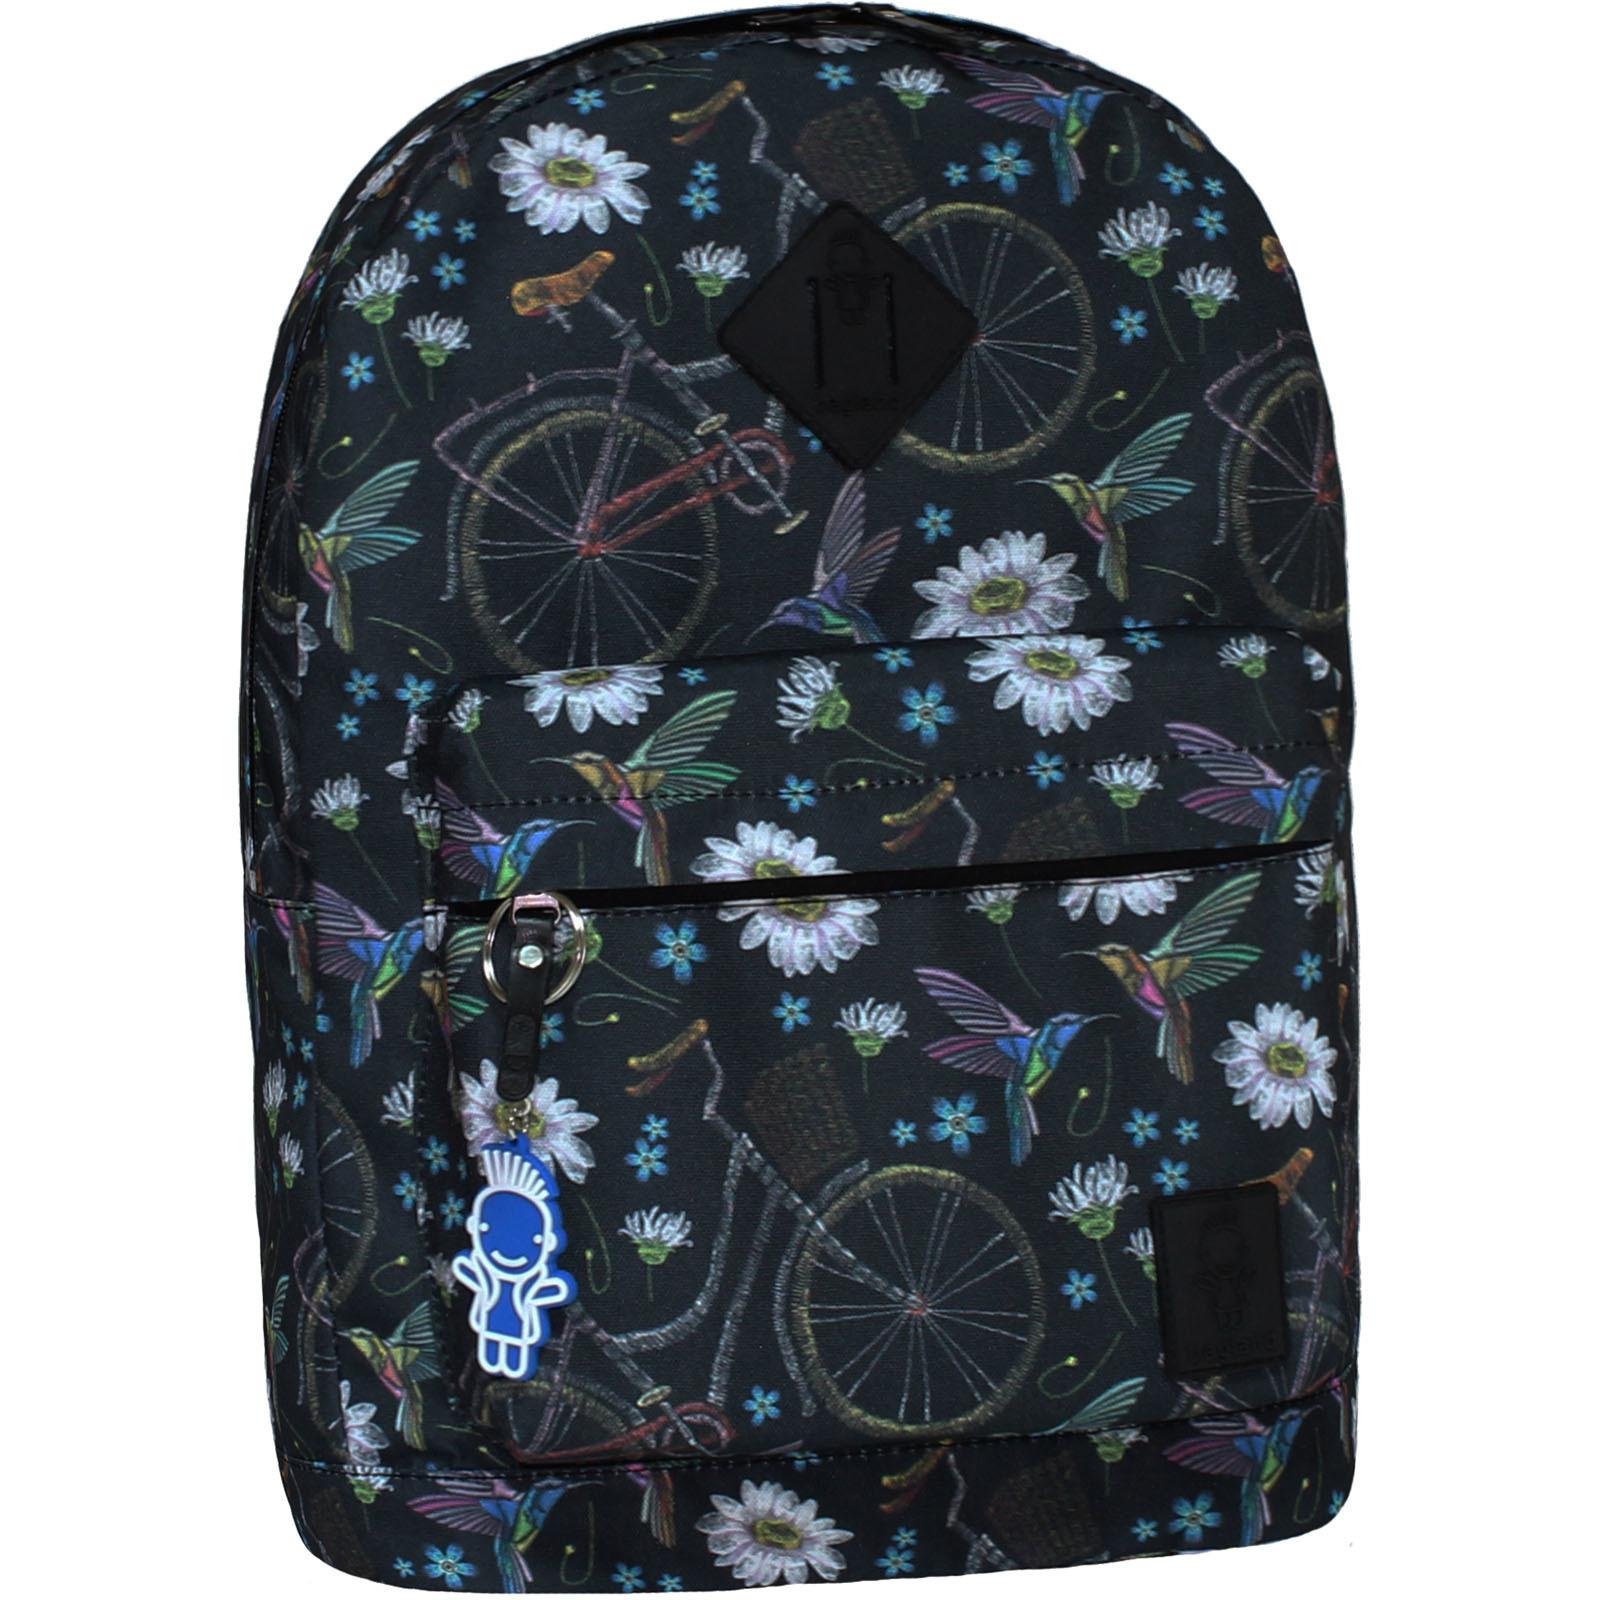 Городские рюкзаки Рюкзак Bagland Молодежный (дизайн) 17 л. сублимация 194 (00533664) IMG_6957_194.JPG